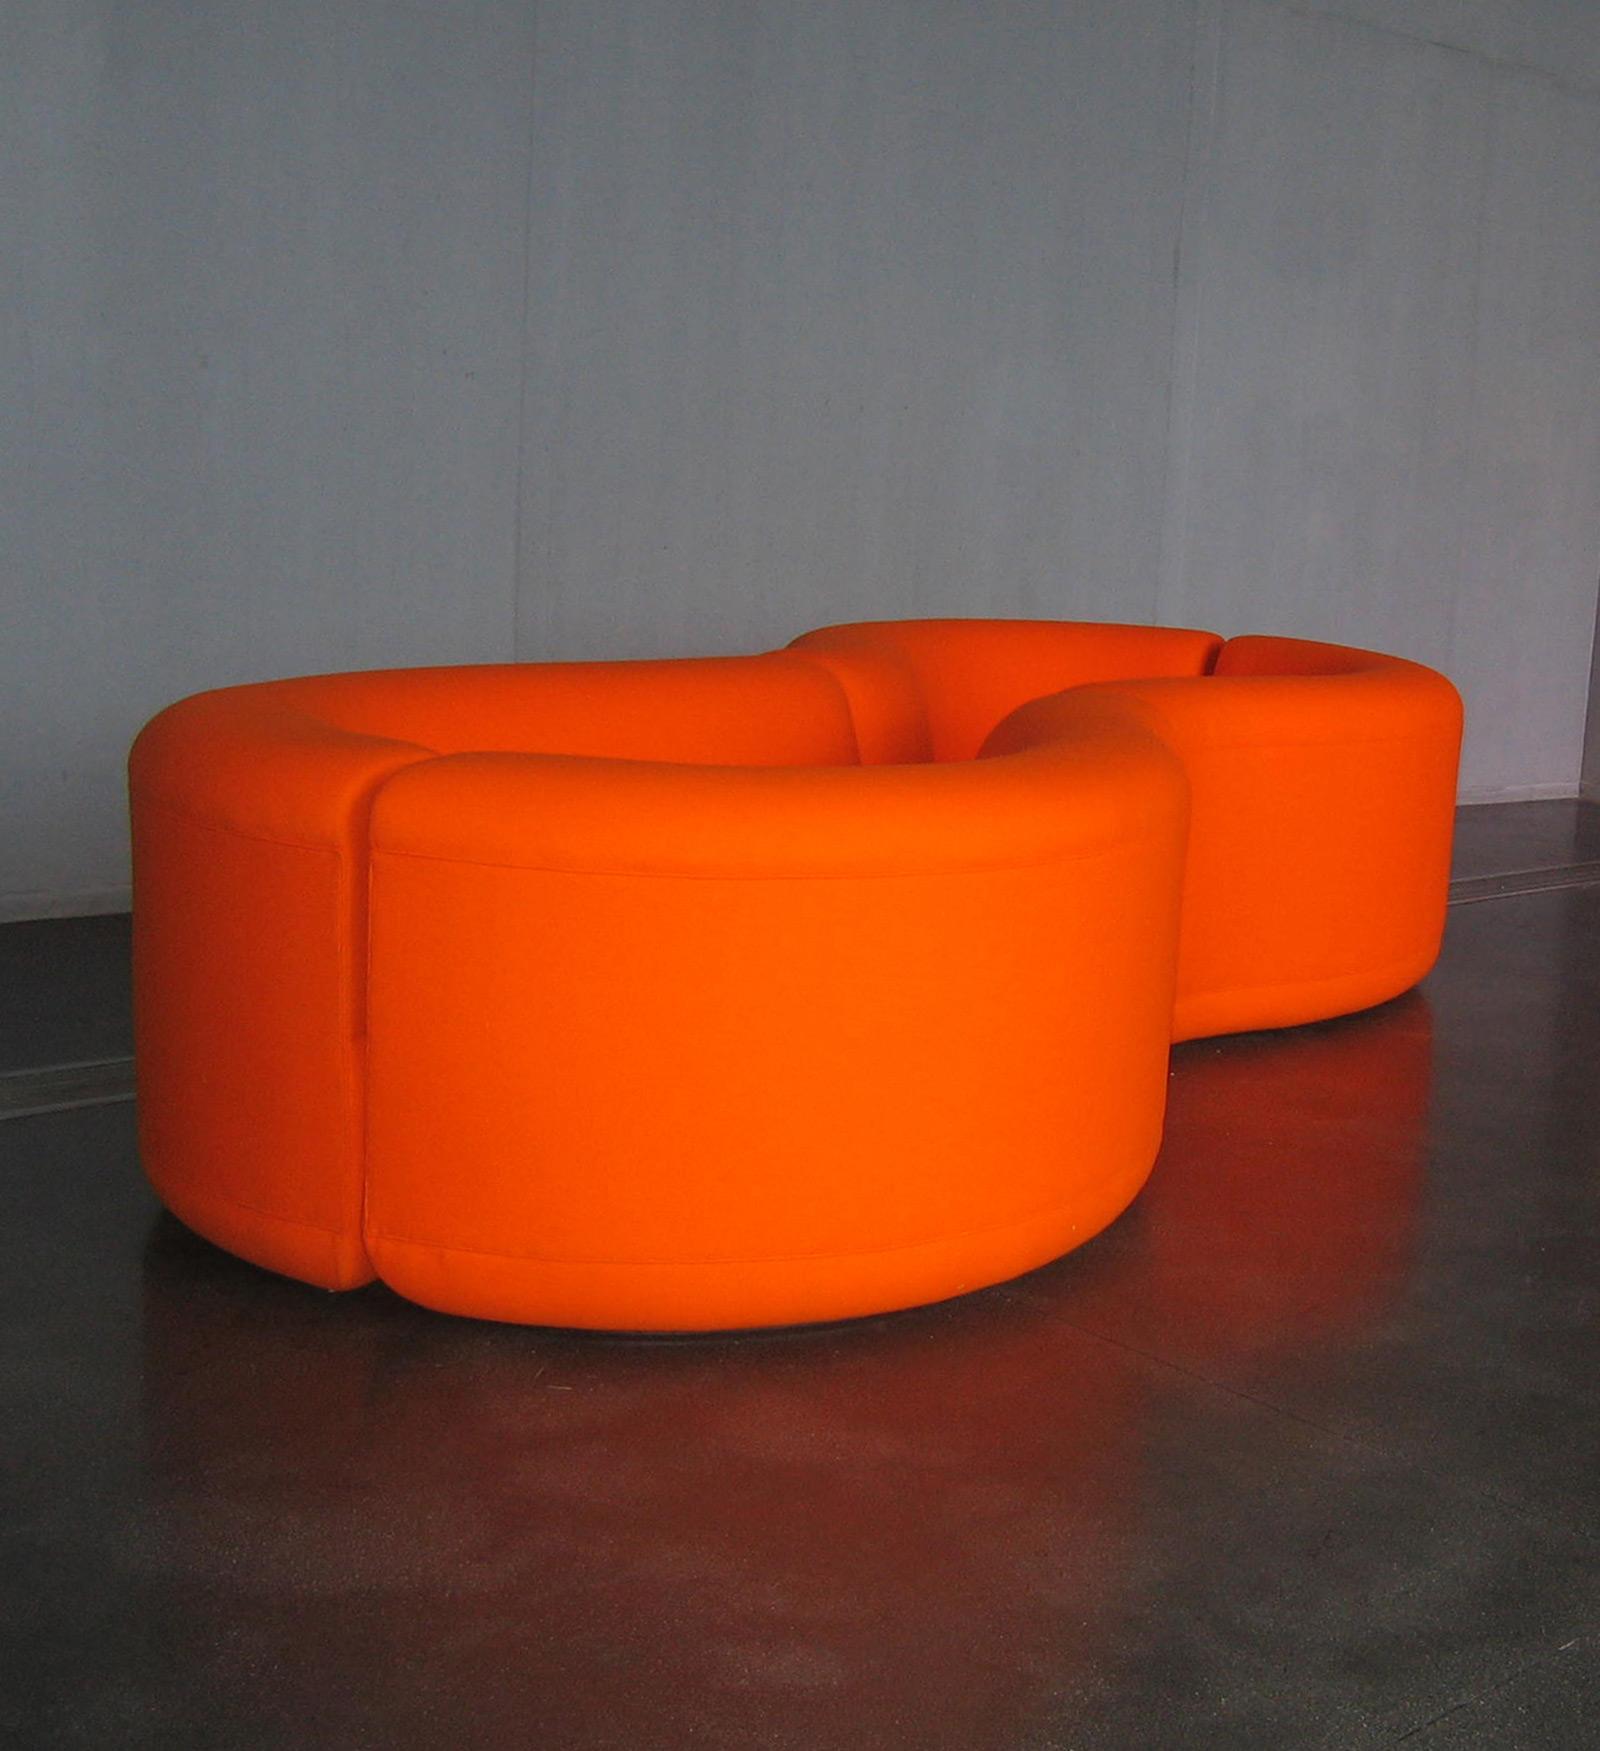 Untitled Furniture Sculpture (Orange Figure 8), 1998